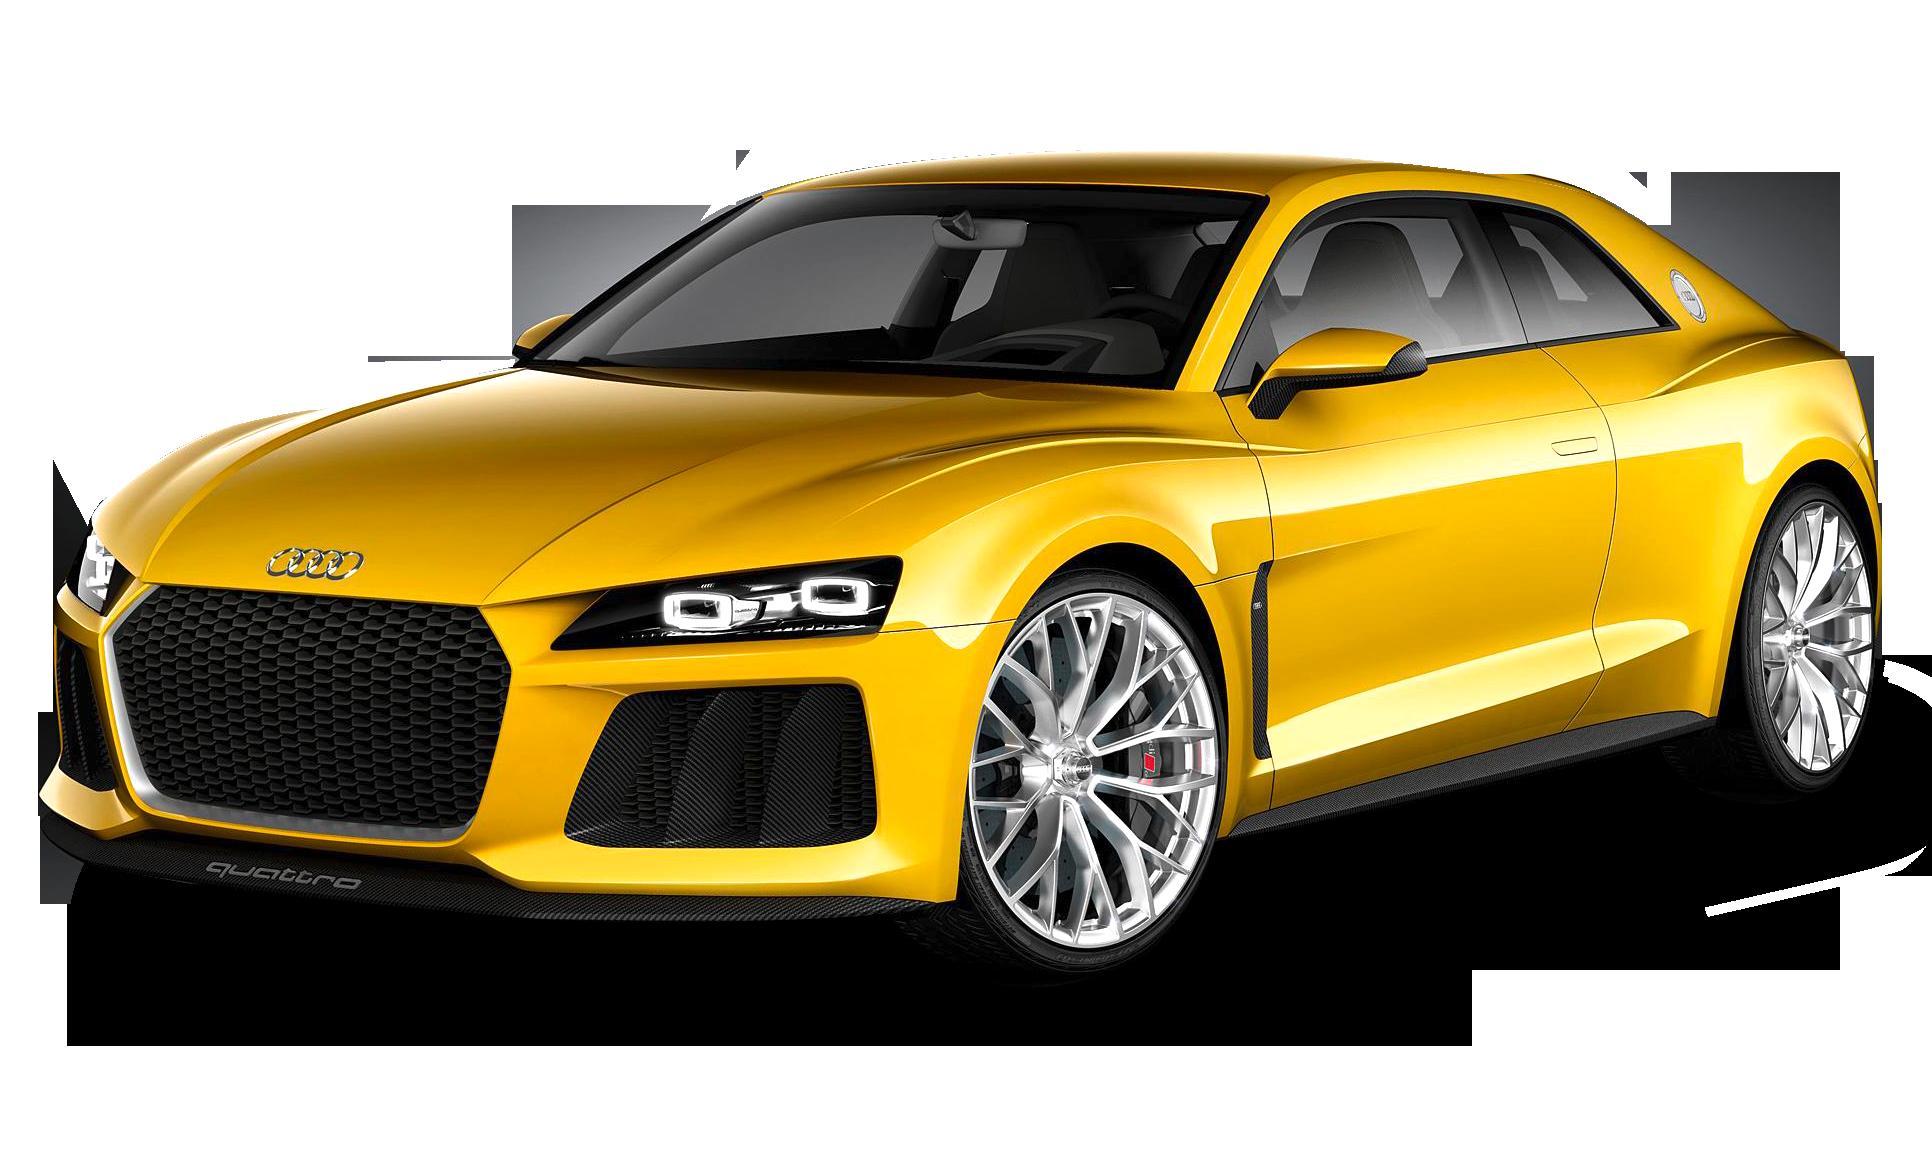 Yellow Audi Car PNG Image.